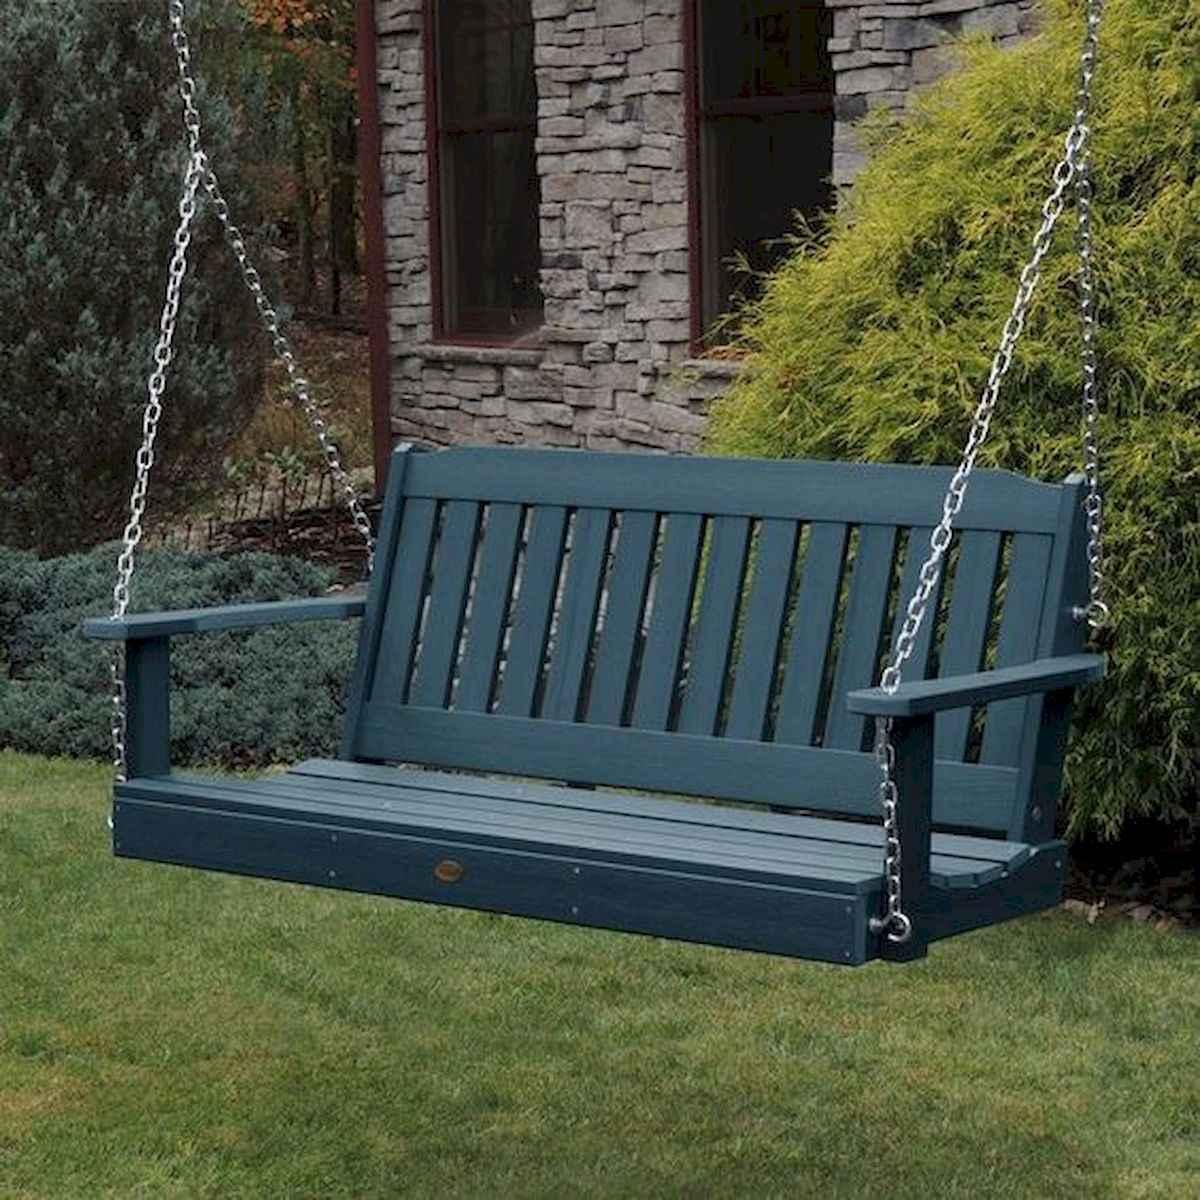 60 Amazing DIY Projects Otdoors Furniture Design Ideas (29)